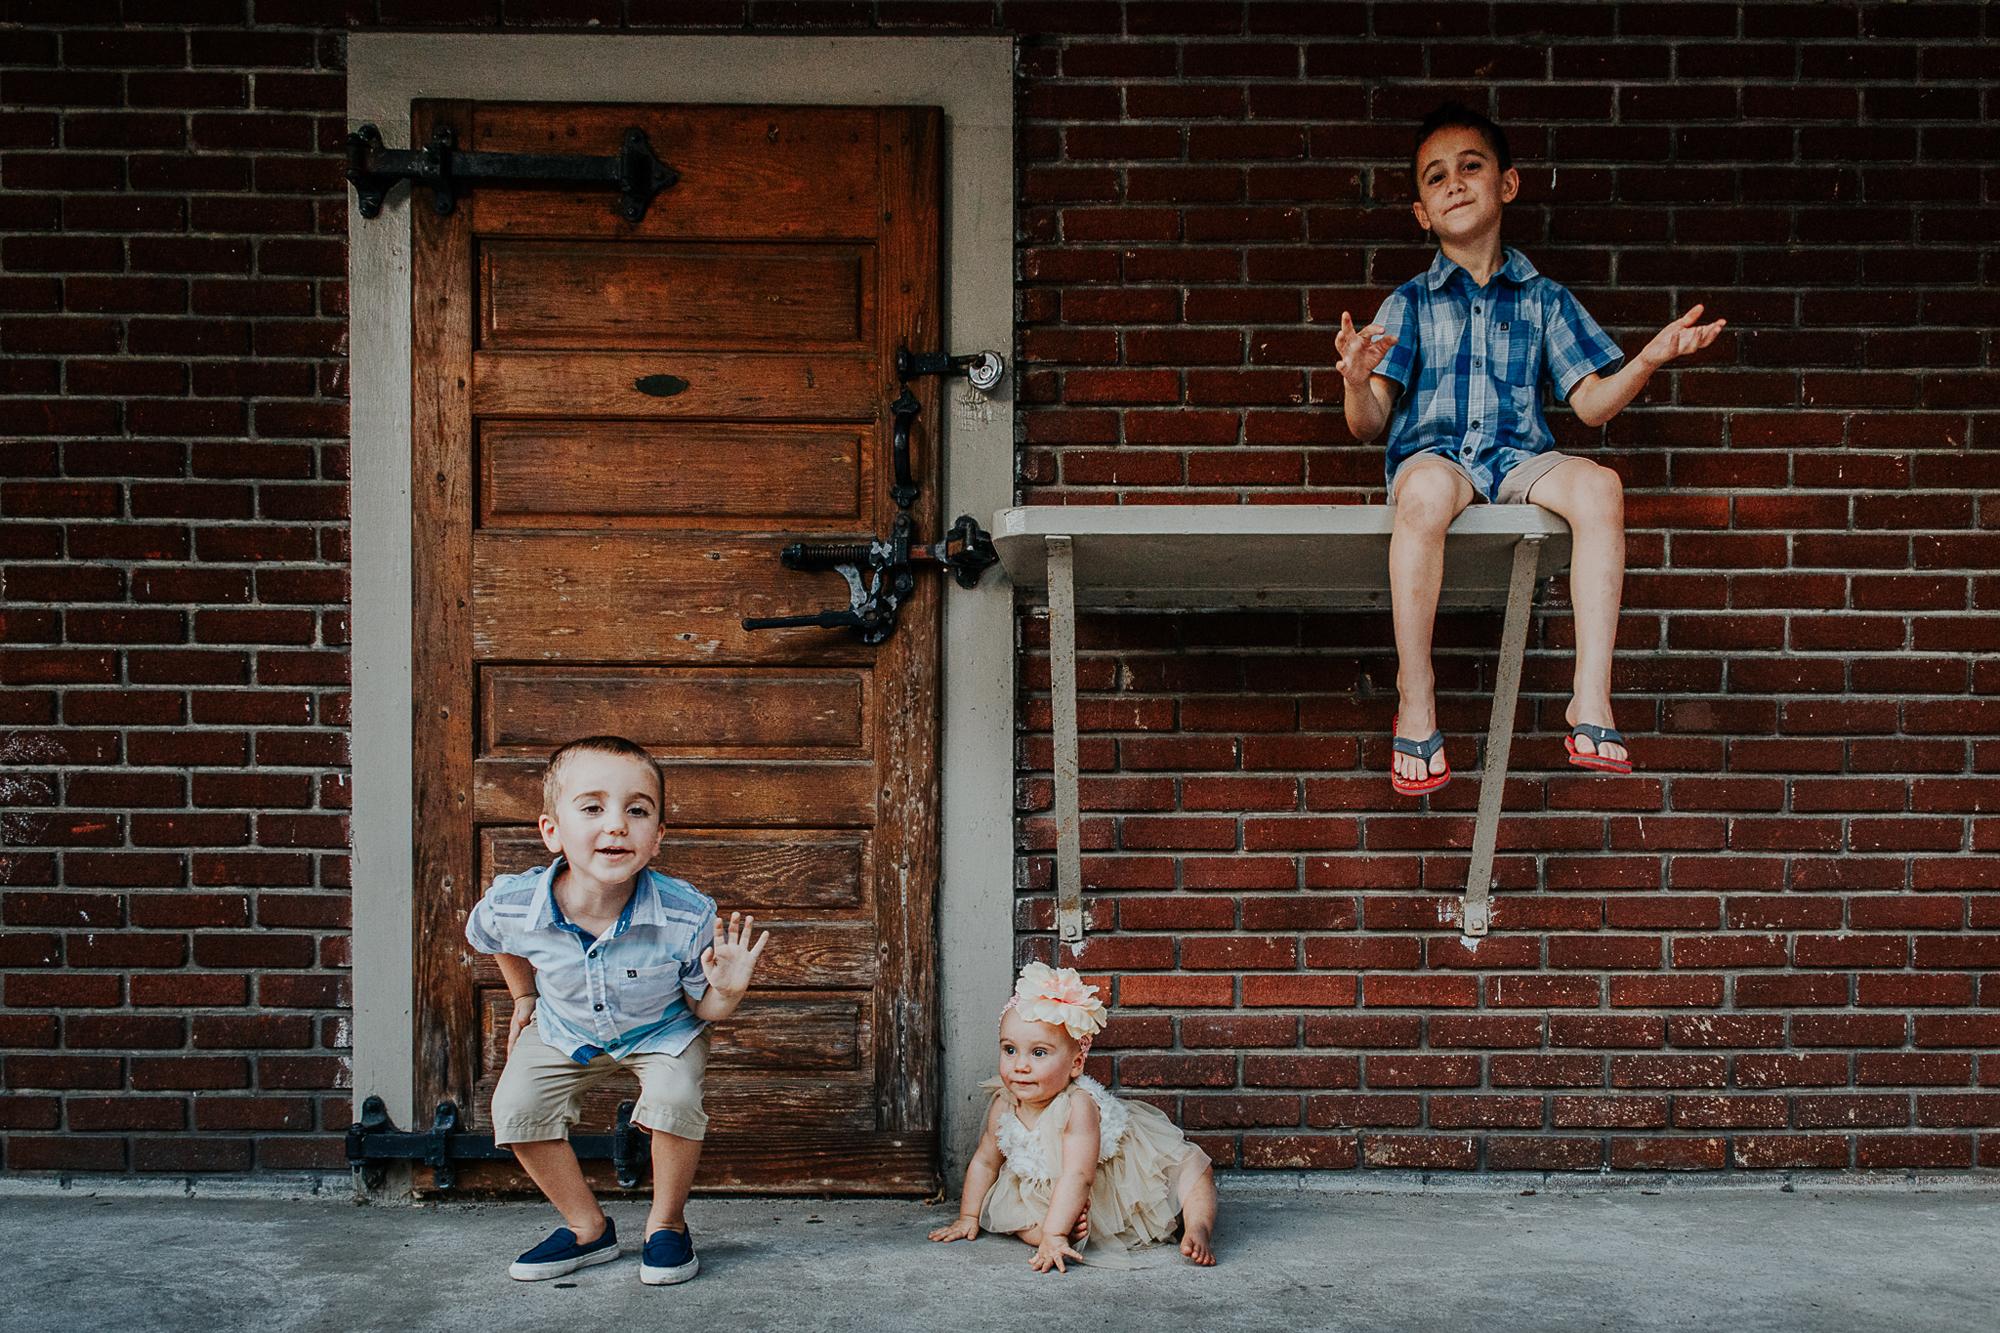 014-oldtown_alexandria_family_photography.jpg